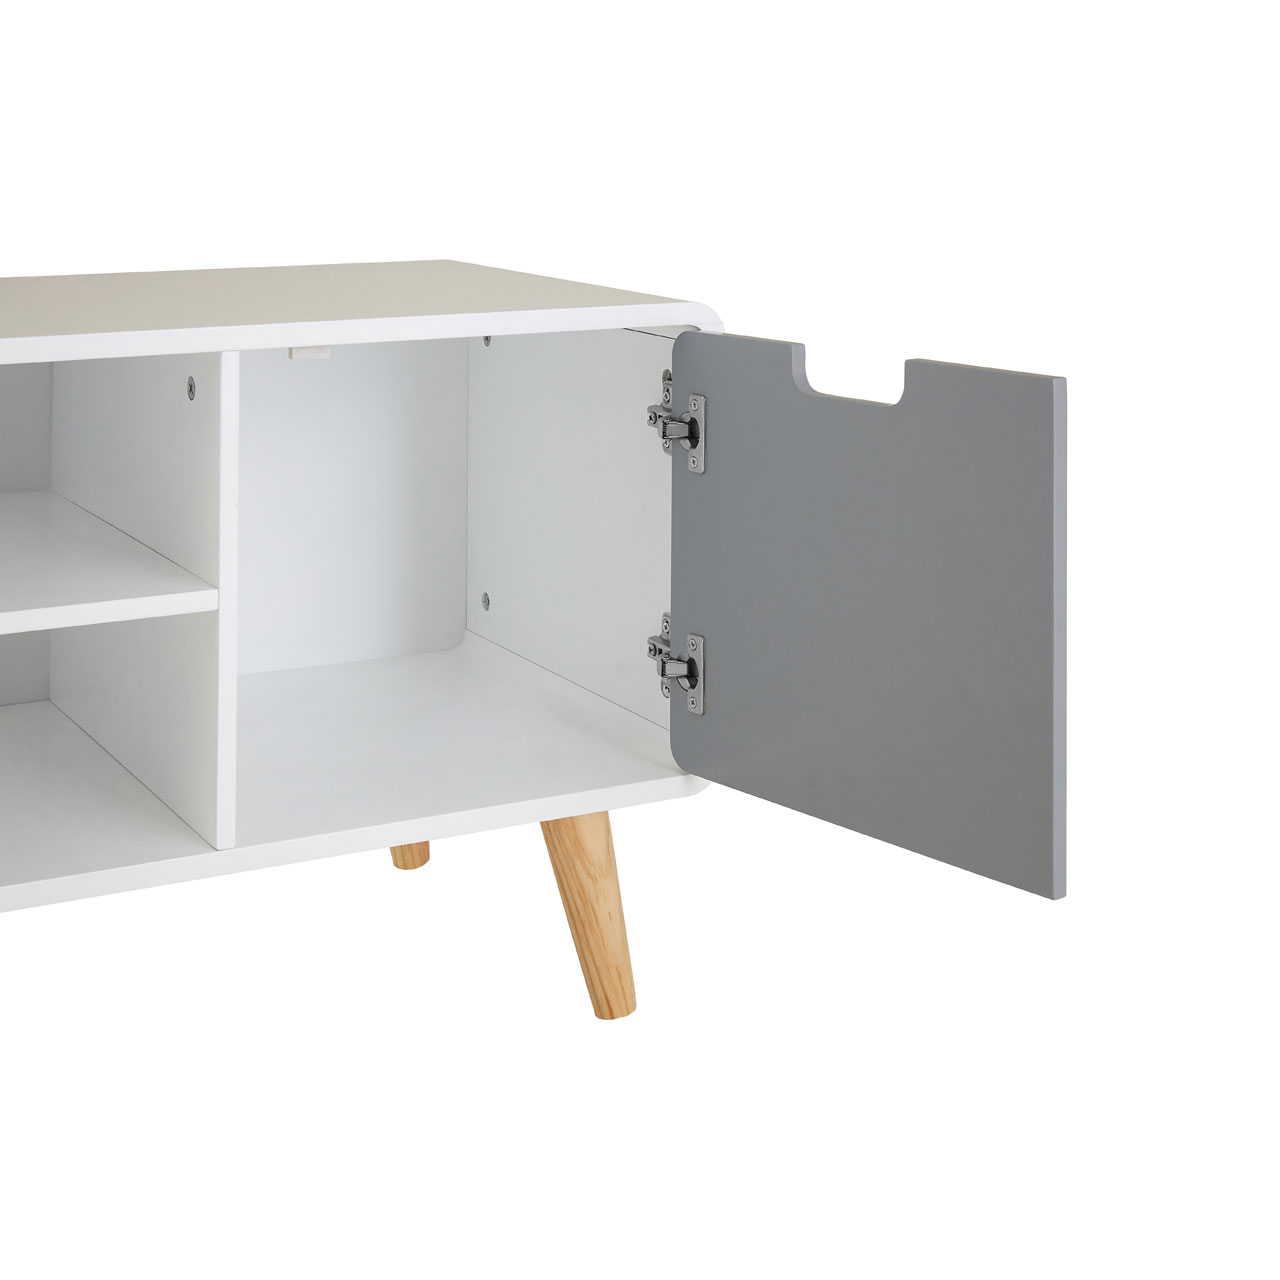 7d70579cb2c Milo TV Stand Media Unit White   Grey Pine Wood Legs Storage Organizer